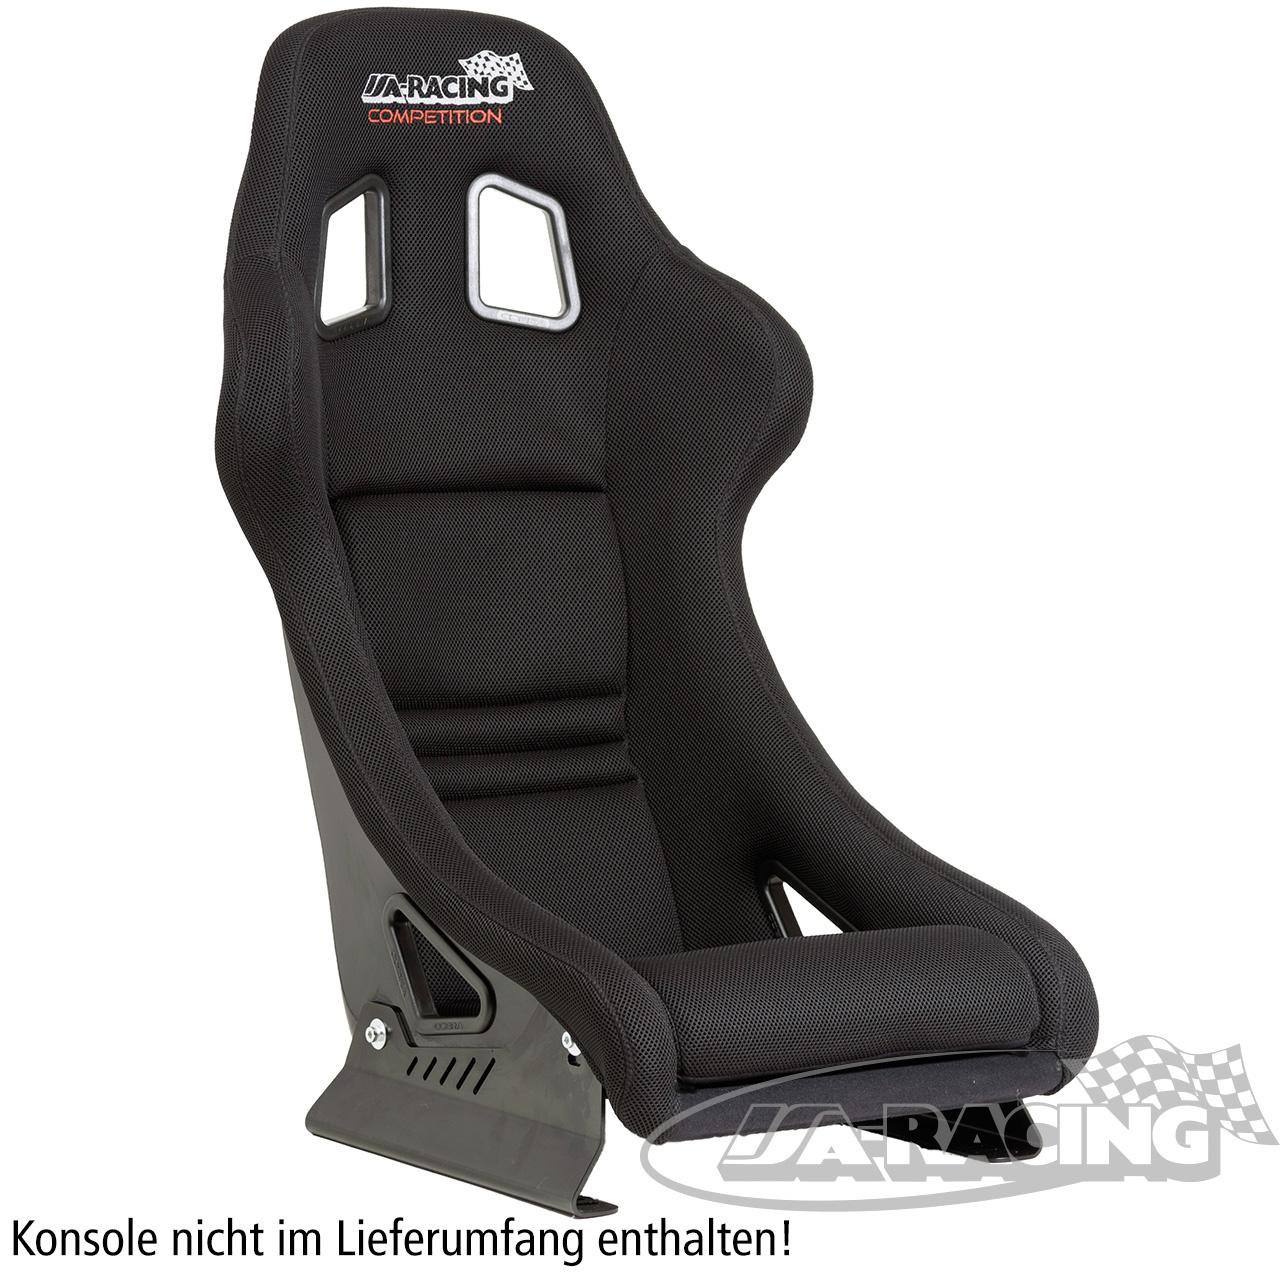 www.isa-racing.com